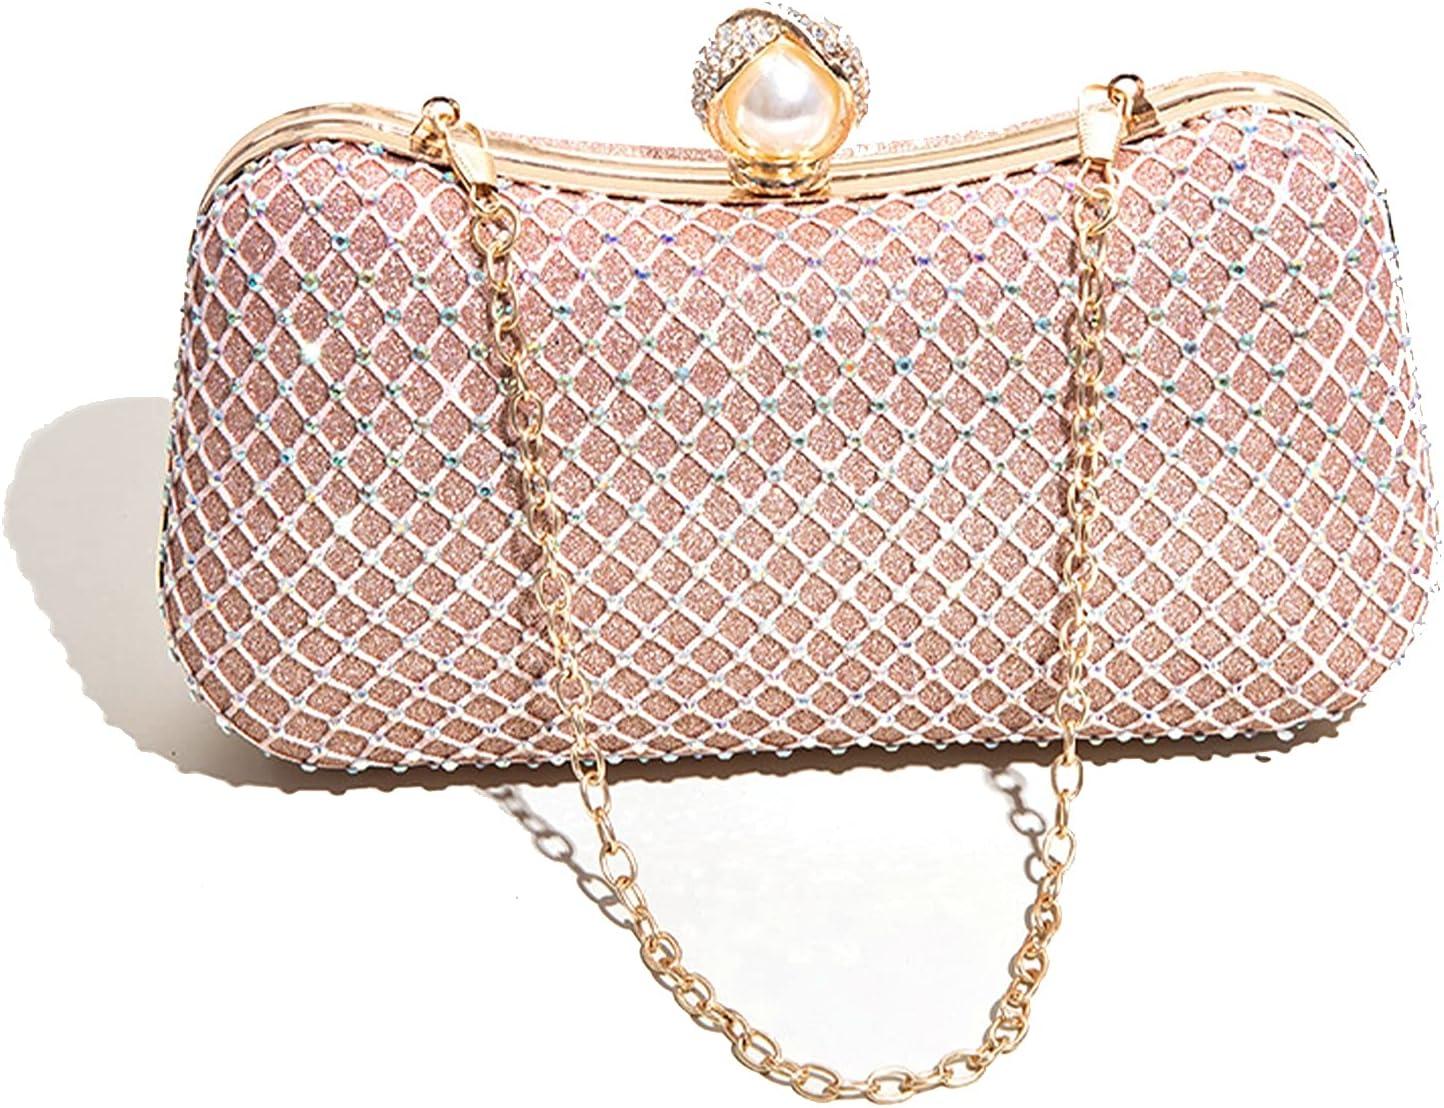 YANGB Handbag Evening Mail order cheap Clutch Bag Pearl Same day shipping Women P Wallet for